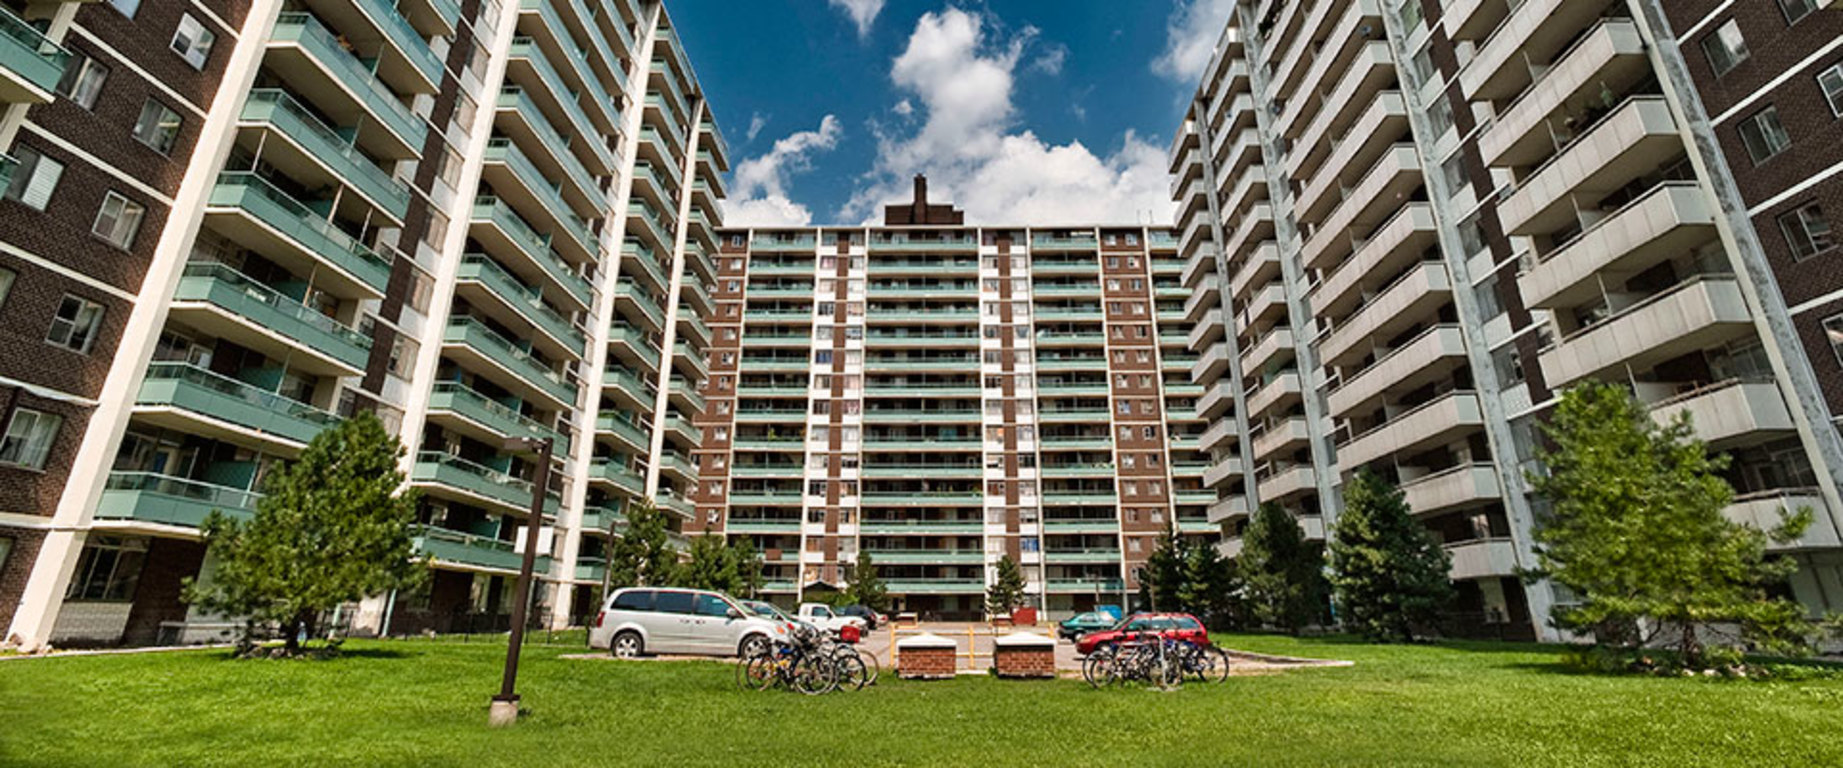 Toronto Central Apartment